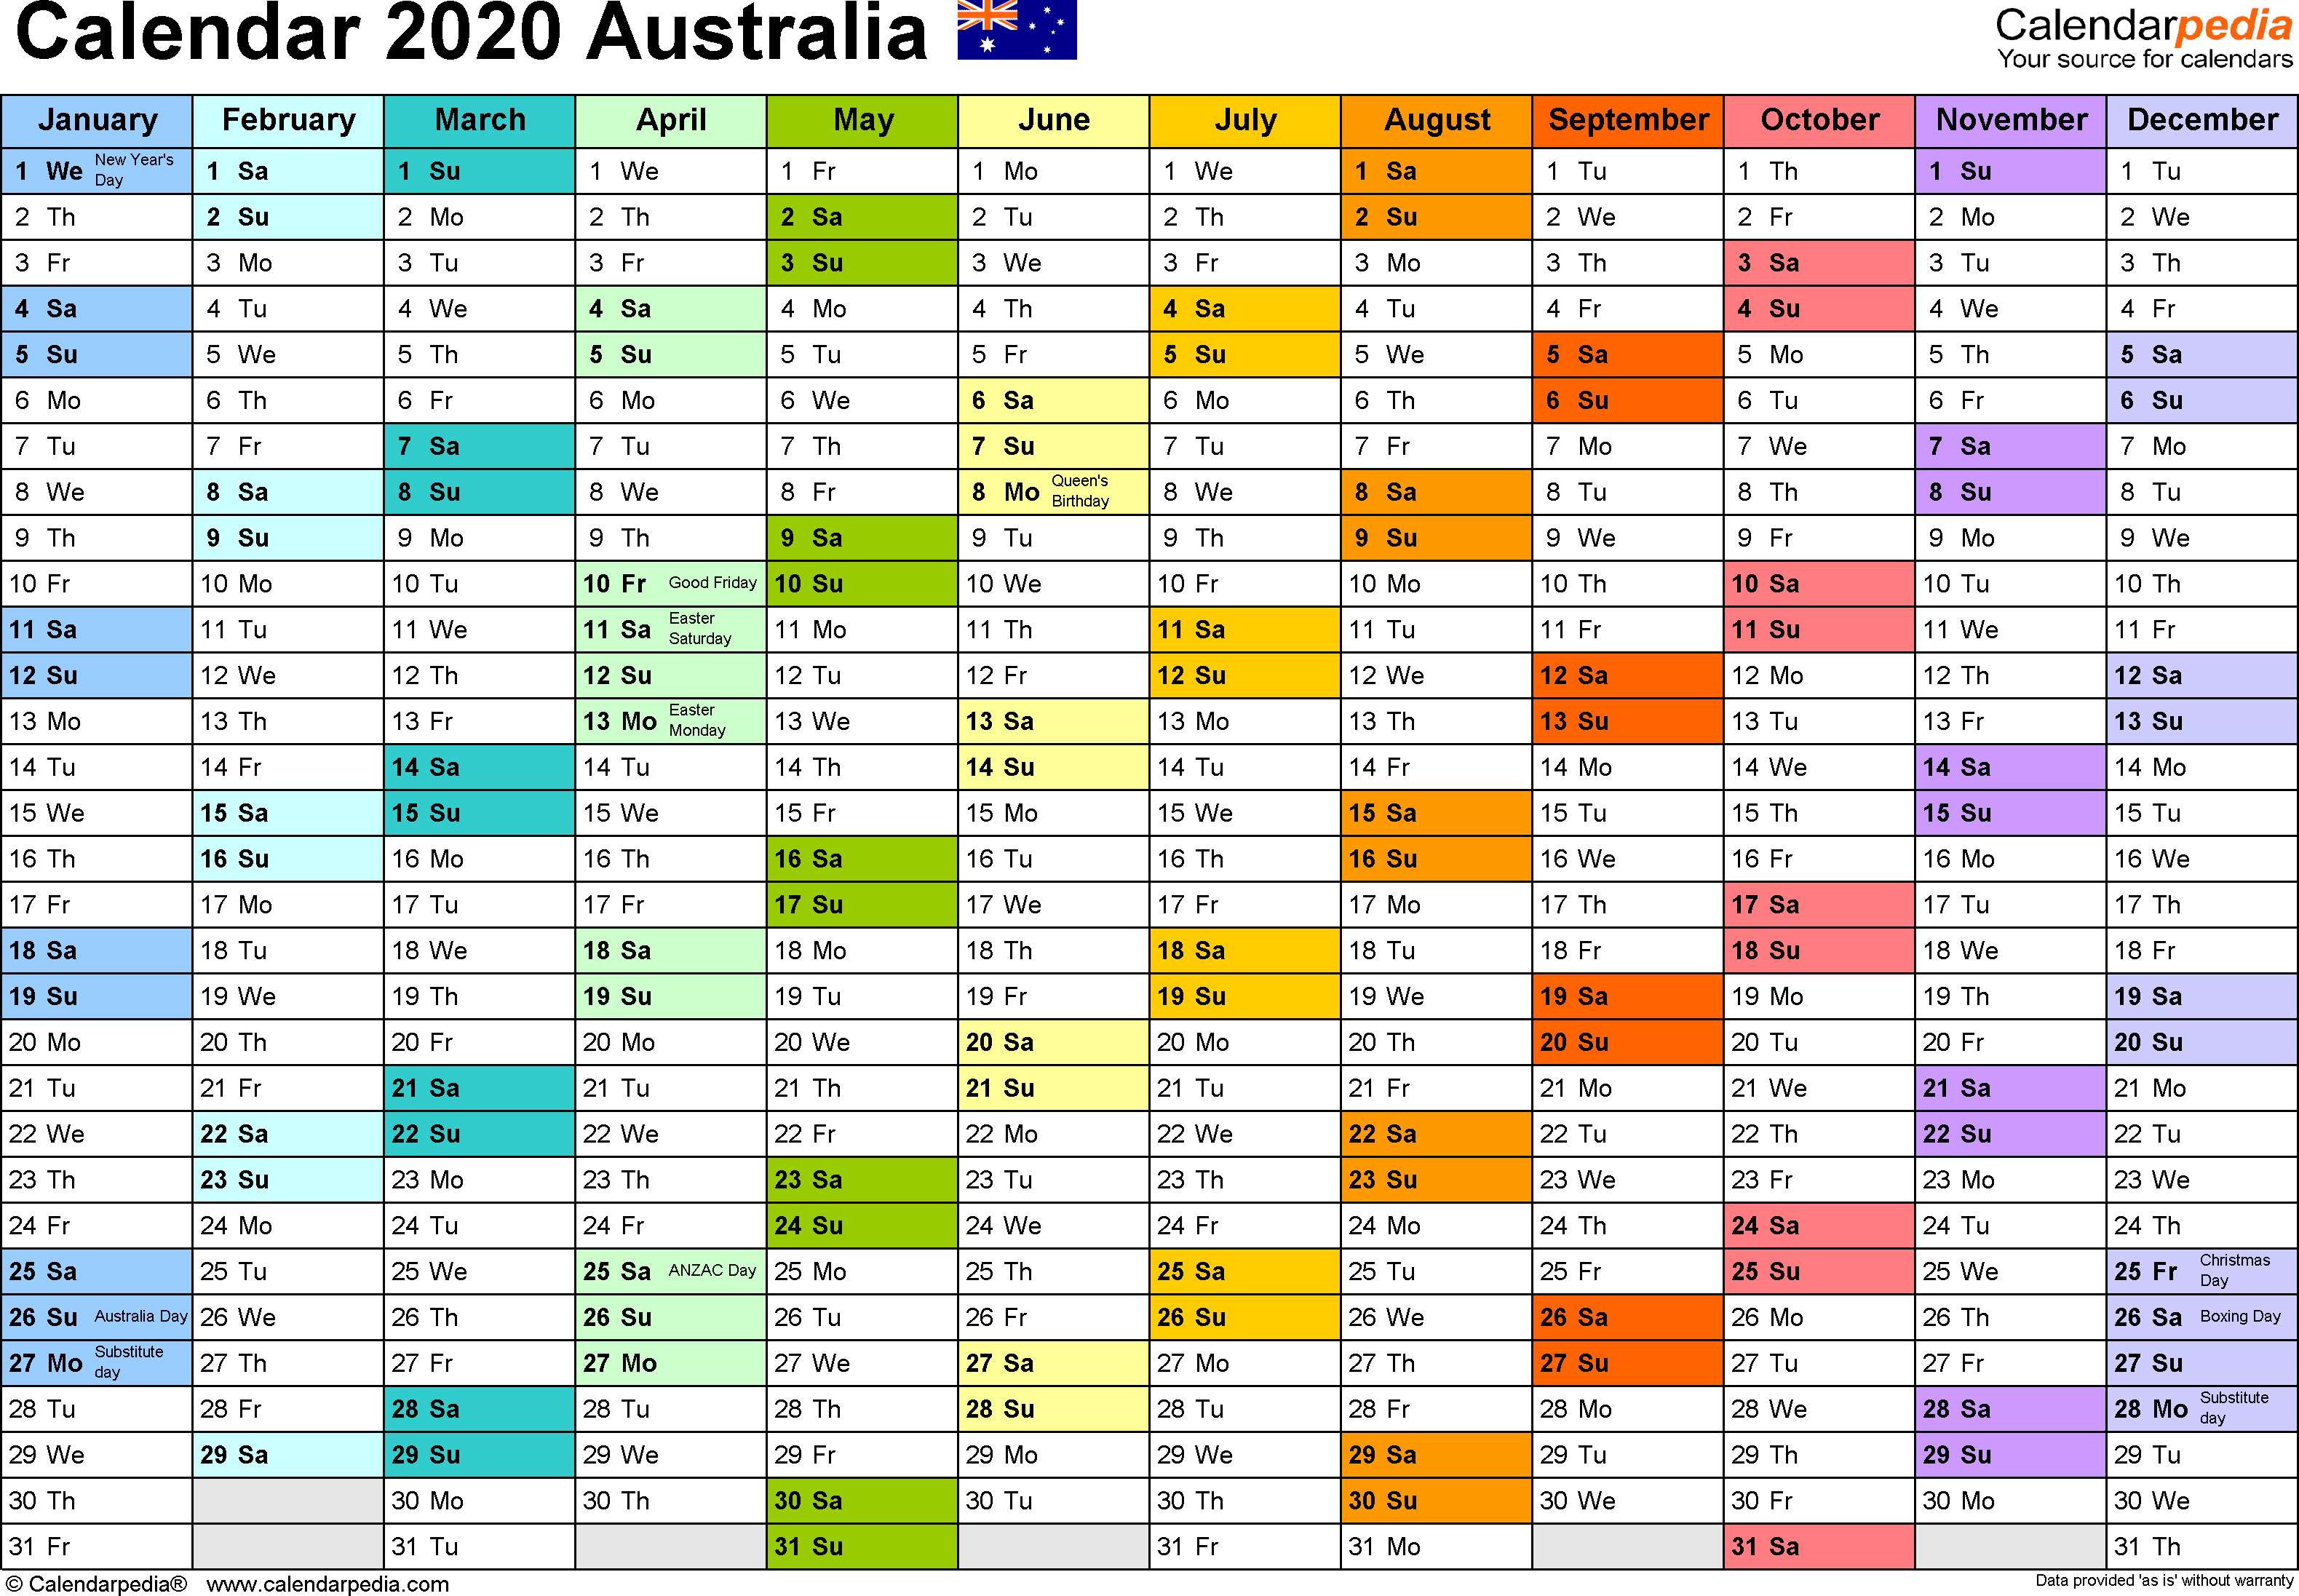 Australia Calendar 2020 - Free Printable Excel Templates regarding 2020 Calendar Time And Date